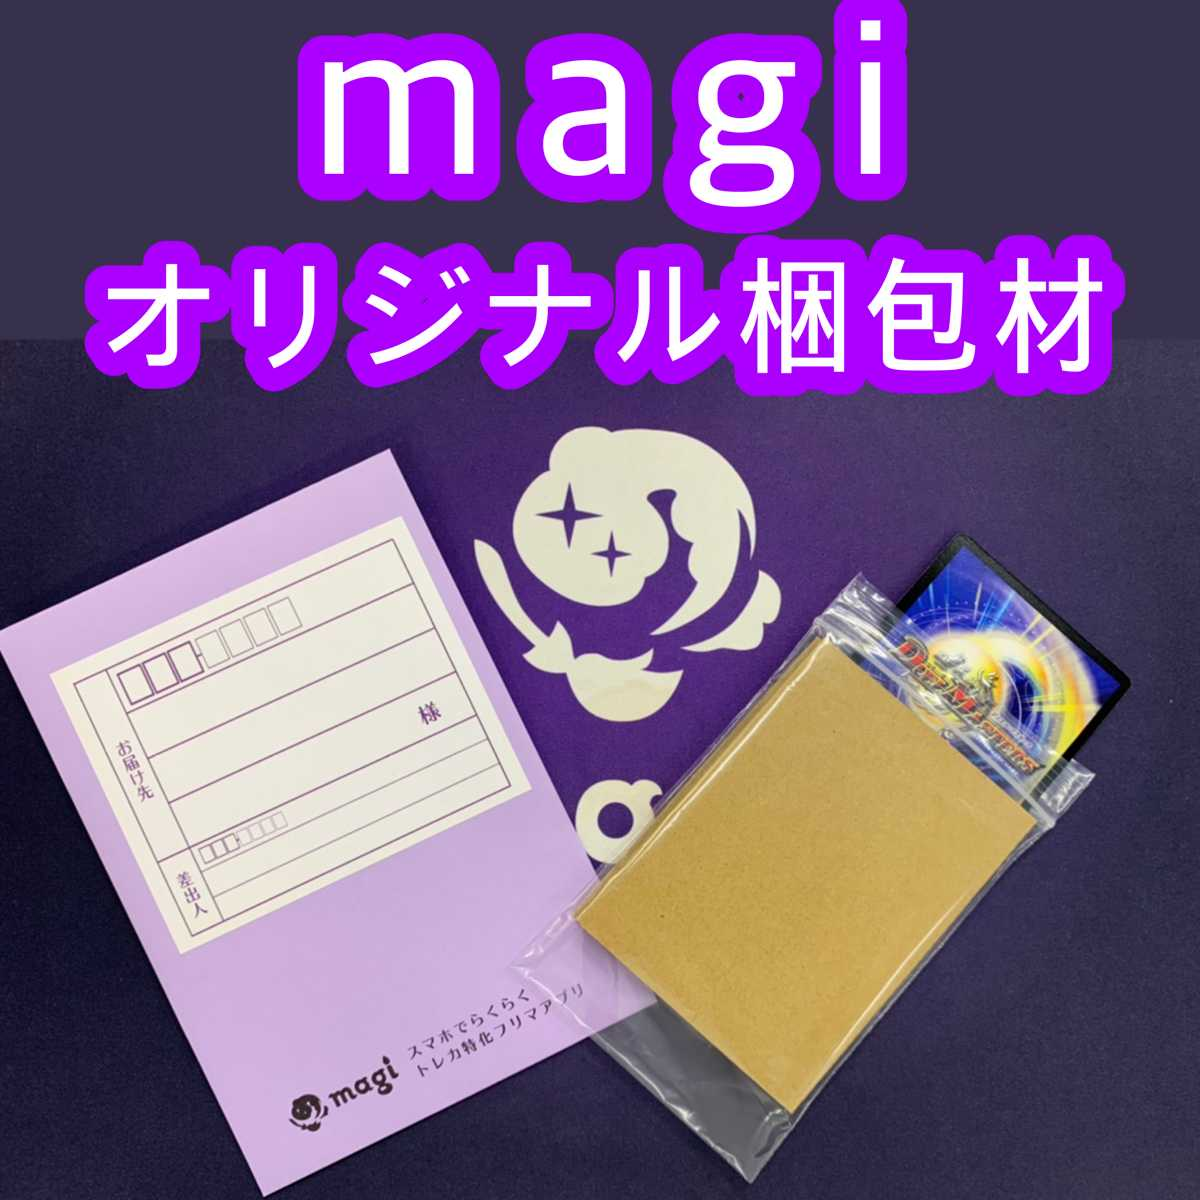 magiオリジナル梱包材